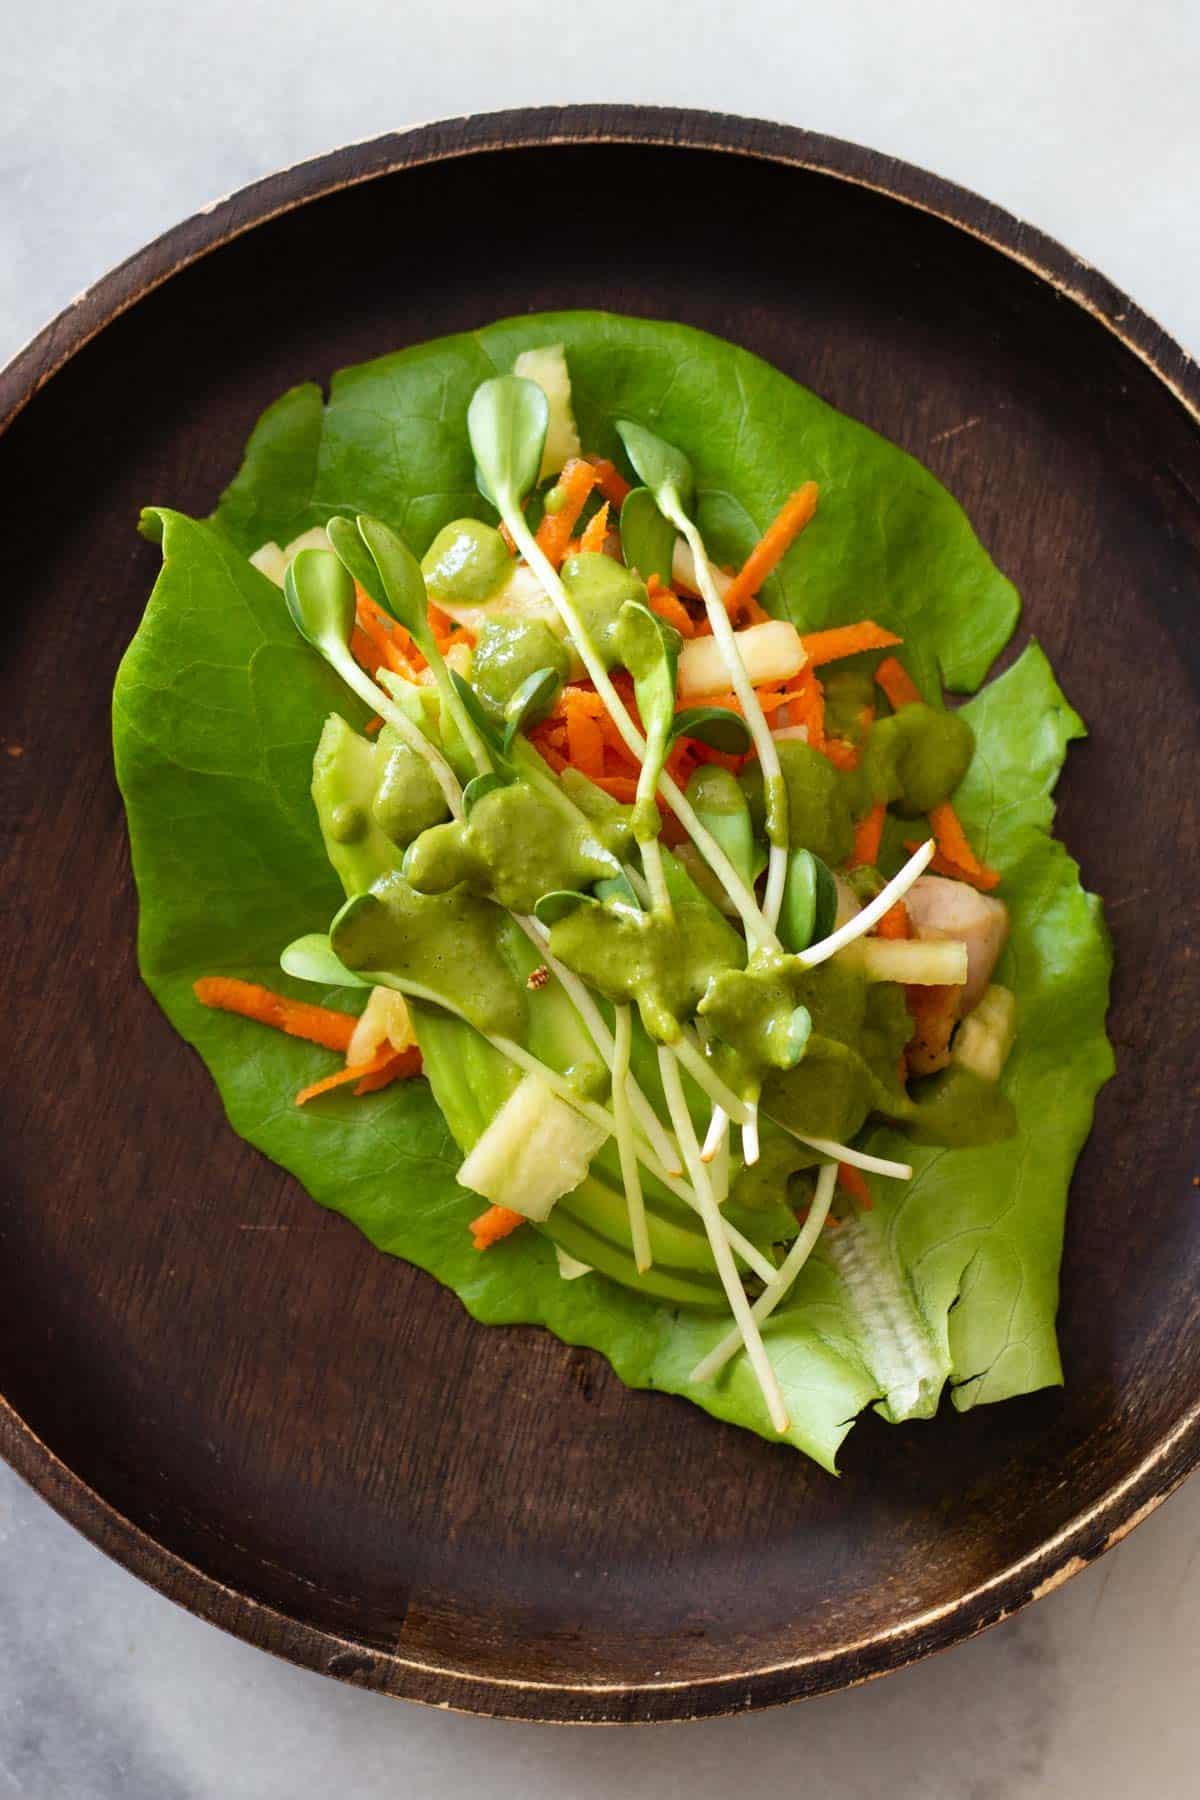 Chicken Lettuce Wrap on a wooden plate